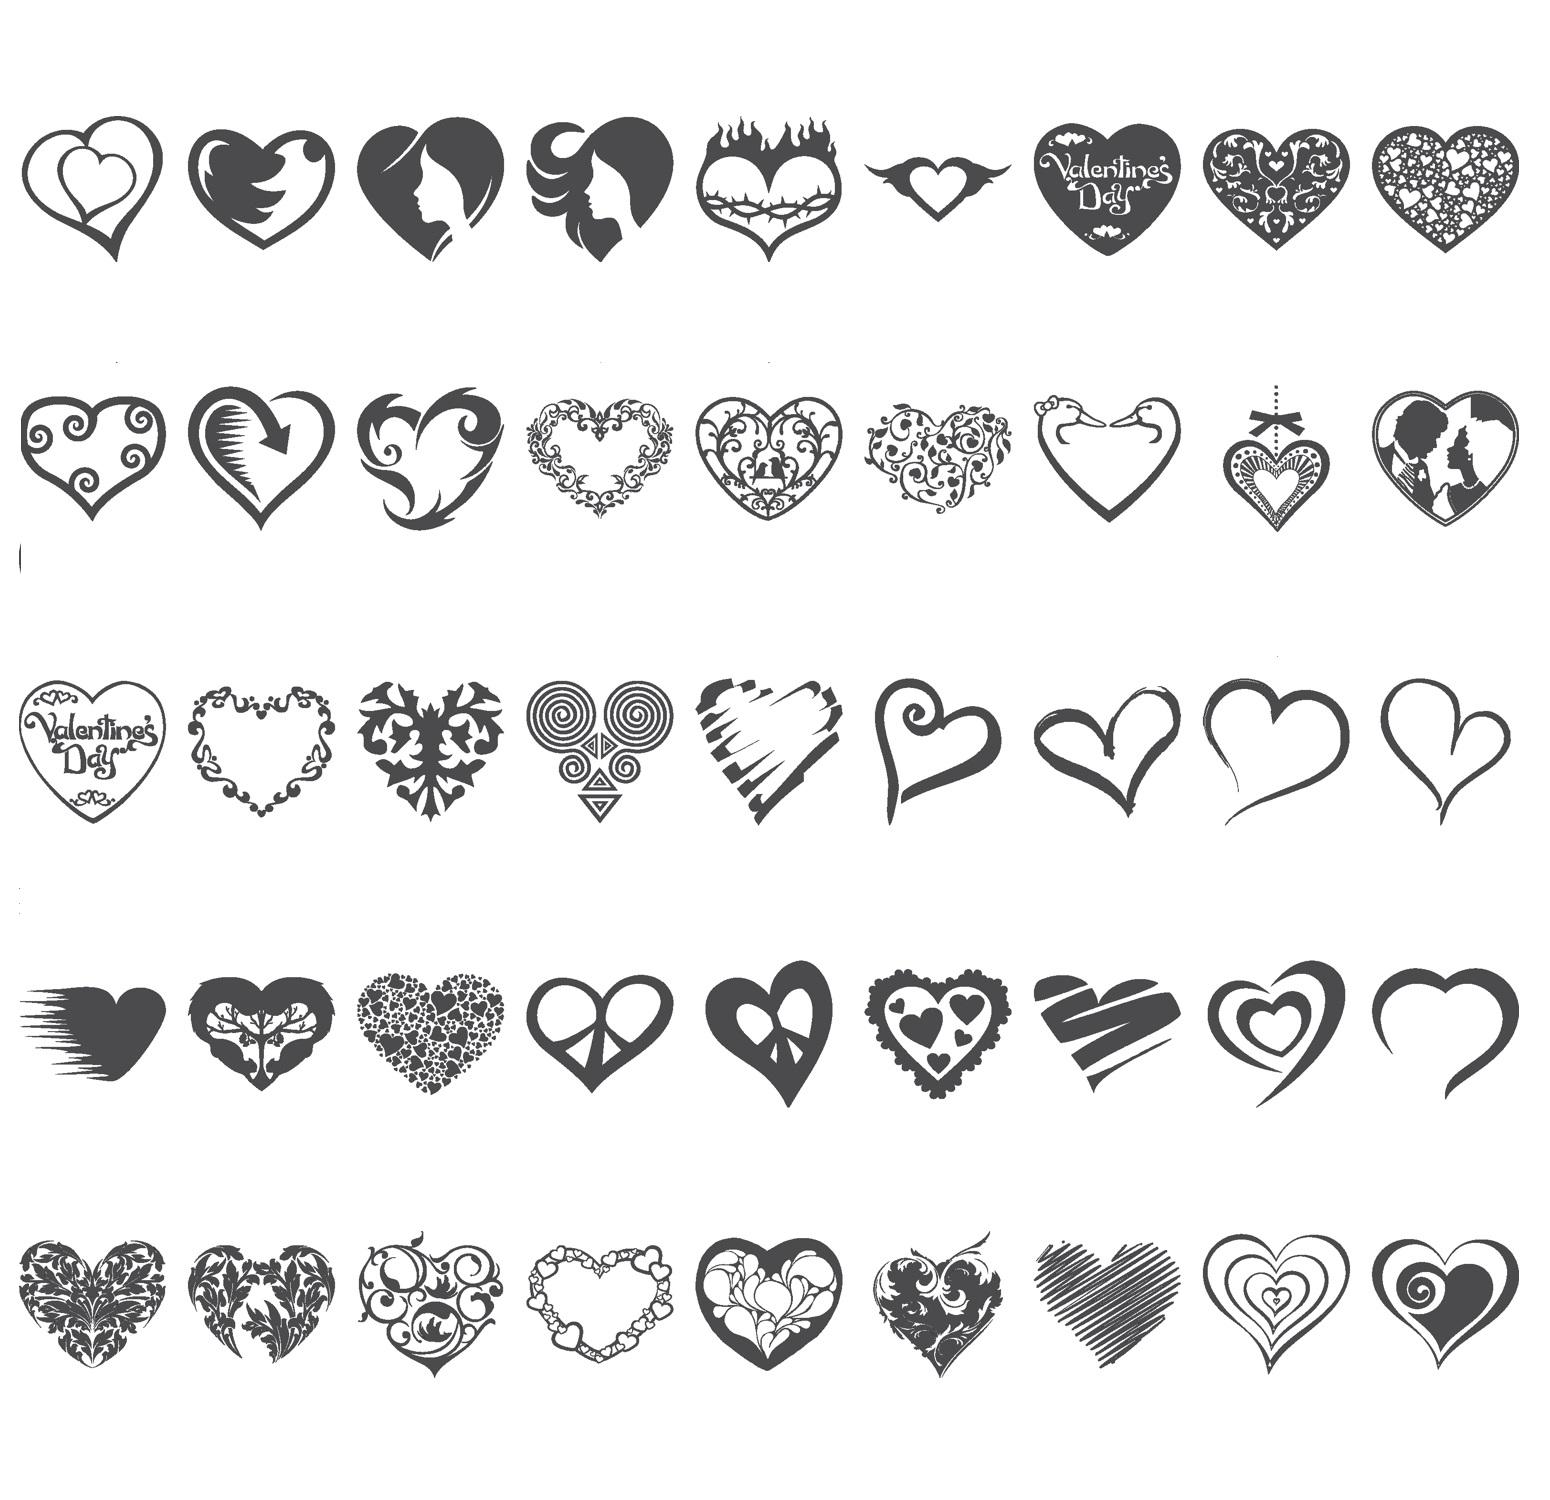 Laser Cut Engrave Valentine's Day Decor Free Vector